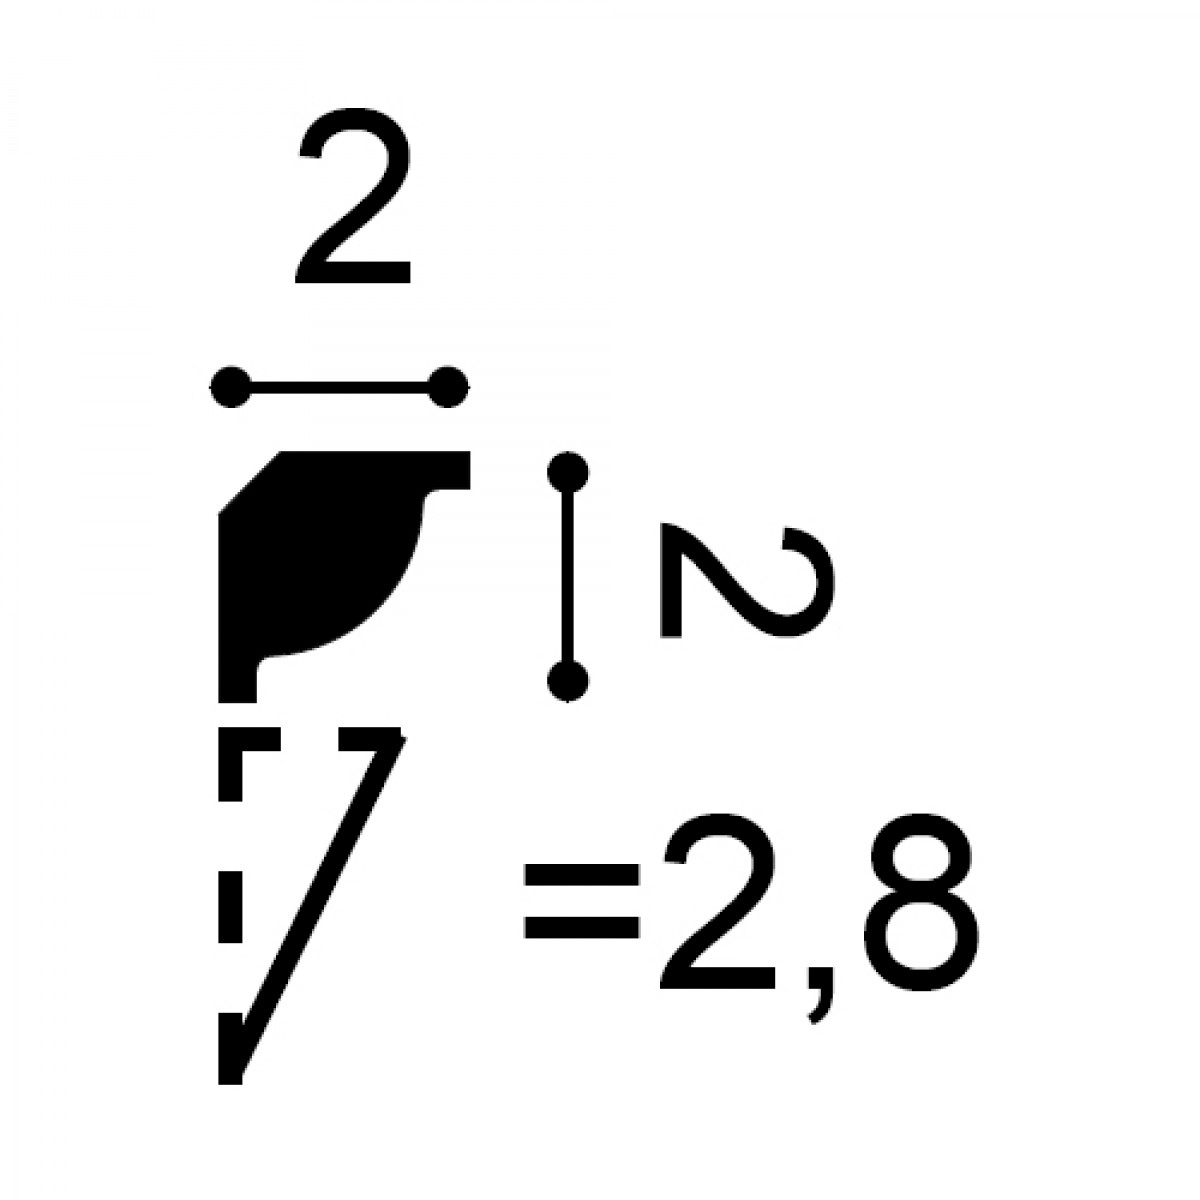 Cornisa Flex Axxent CX132F, Dimensiuni: 200 X 2 X 2 cm, Orac Decor